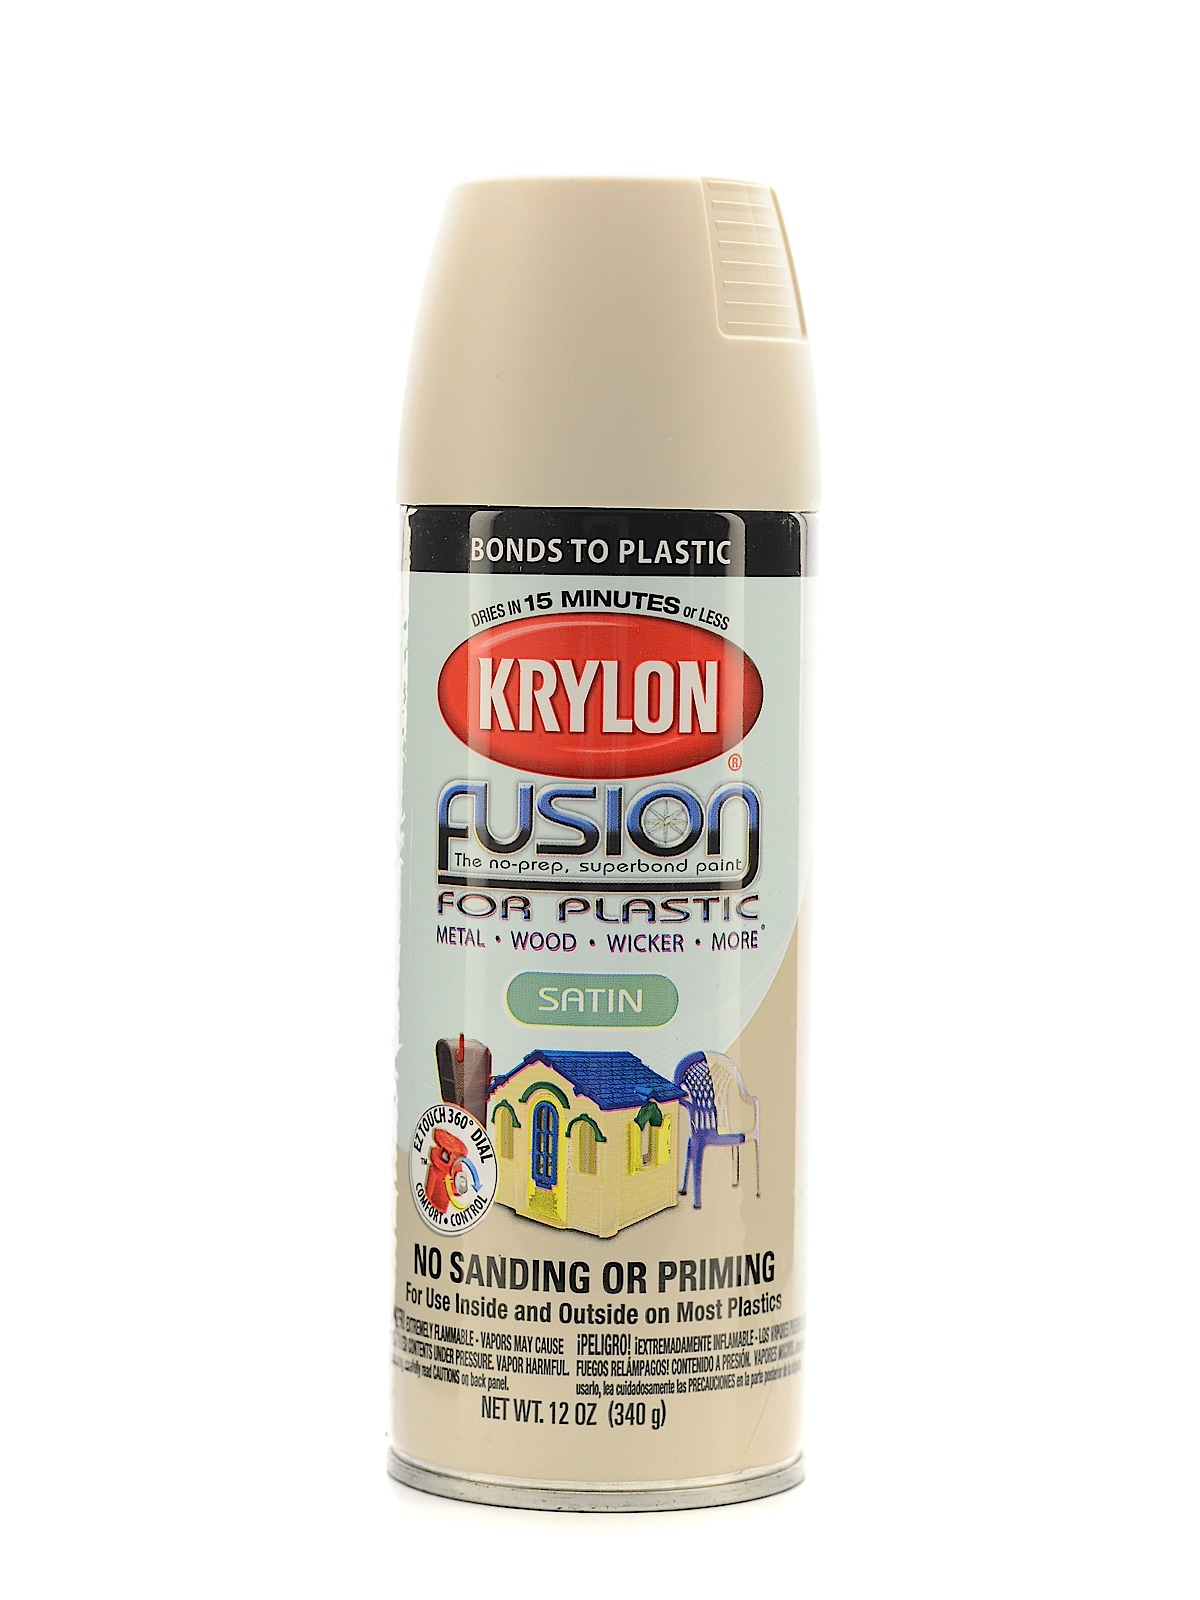 Krylon fusion spray paint for plastic misterart fusion spray paint for plastic almond satin geenschuldenfo Images